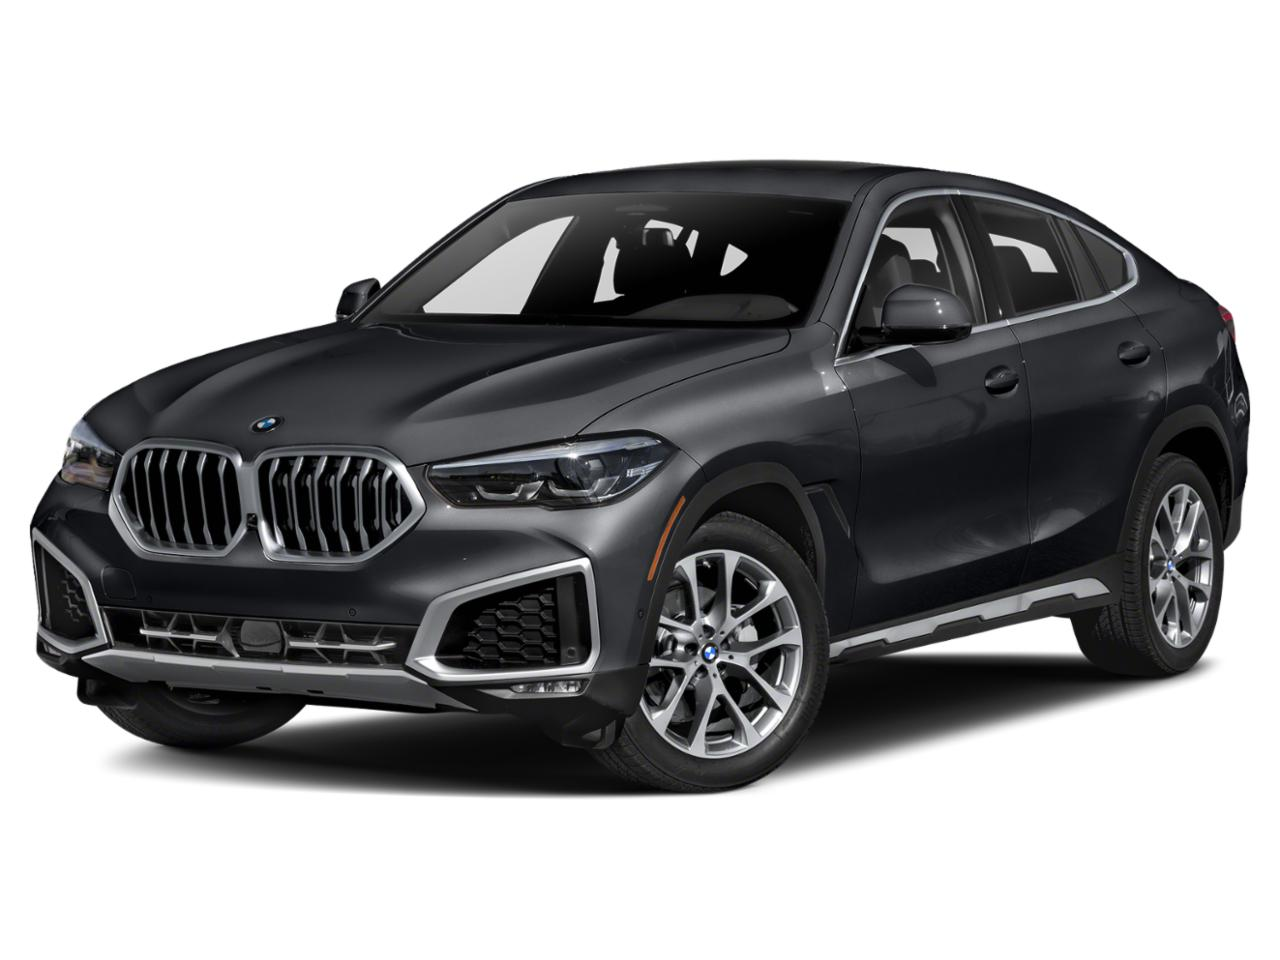 2021 BMW X6 M50i Vehicle Photo in Grapevine, TX 76051